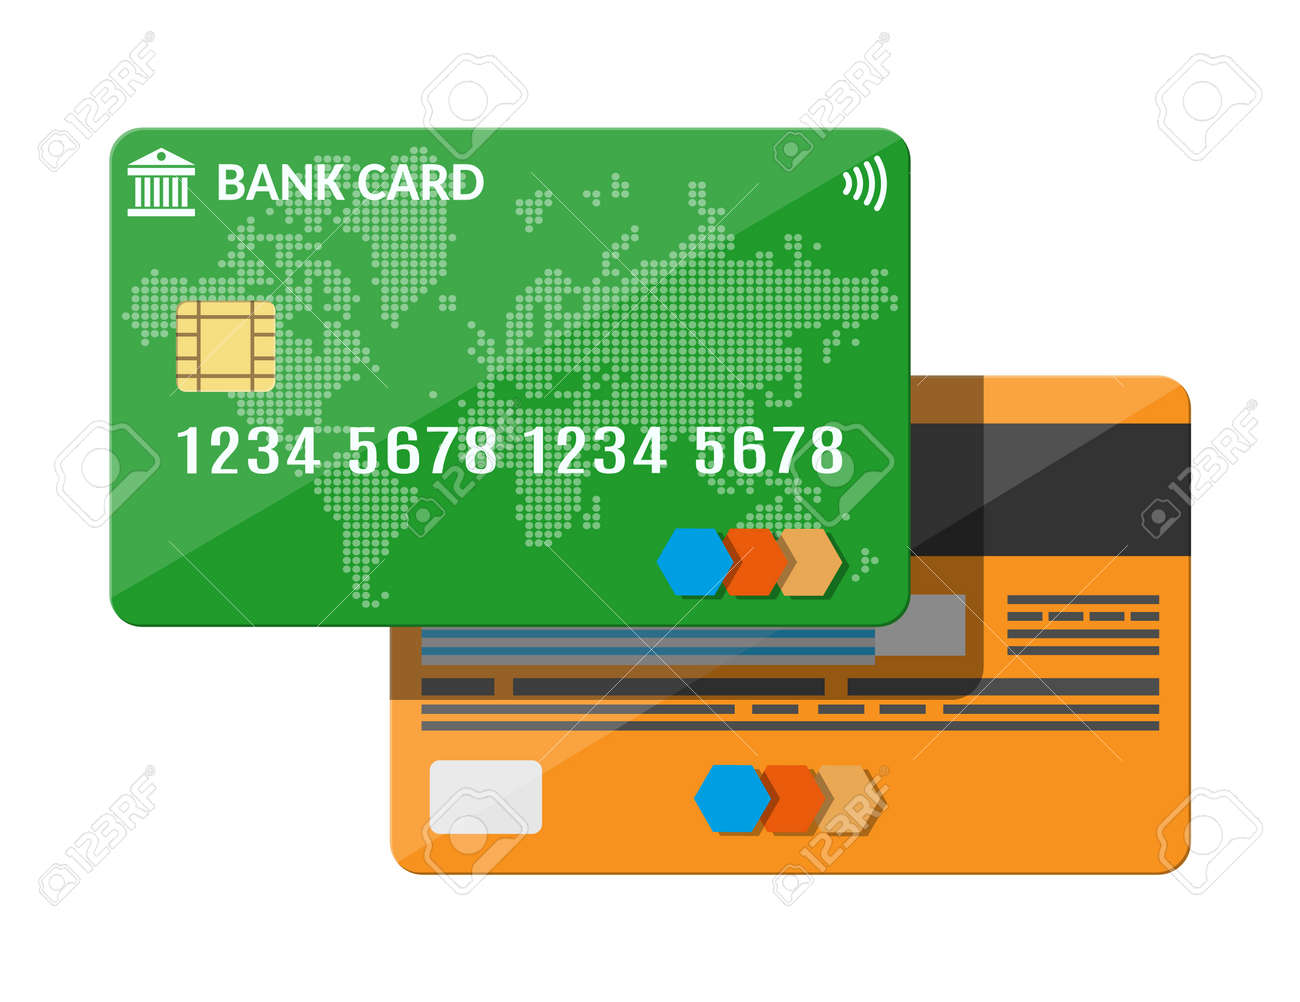 bank card credit card template ロイヤリティフリークリップアート